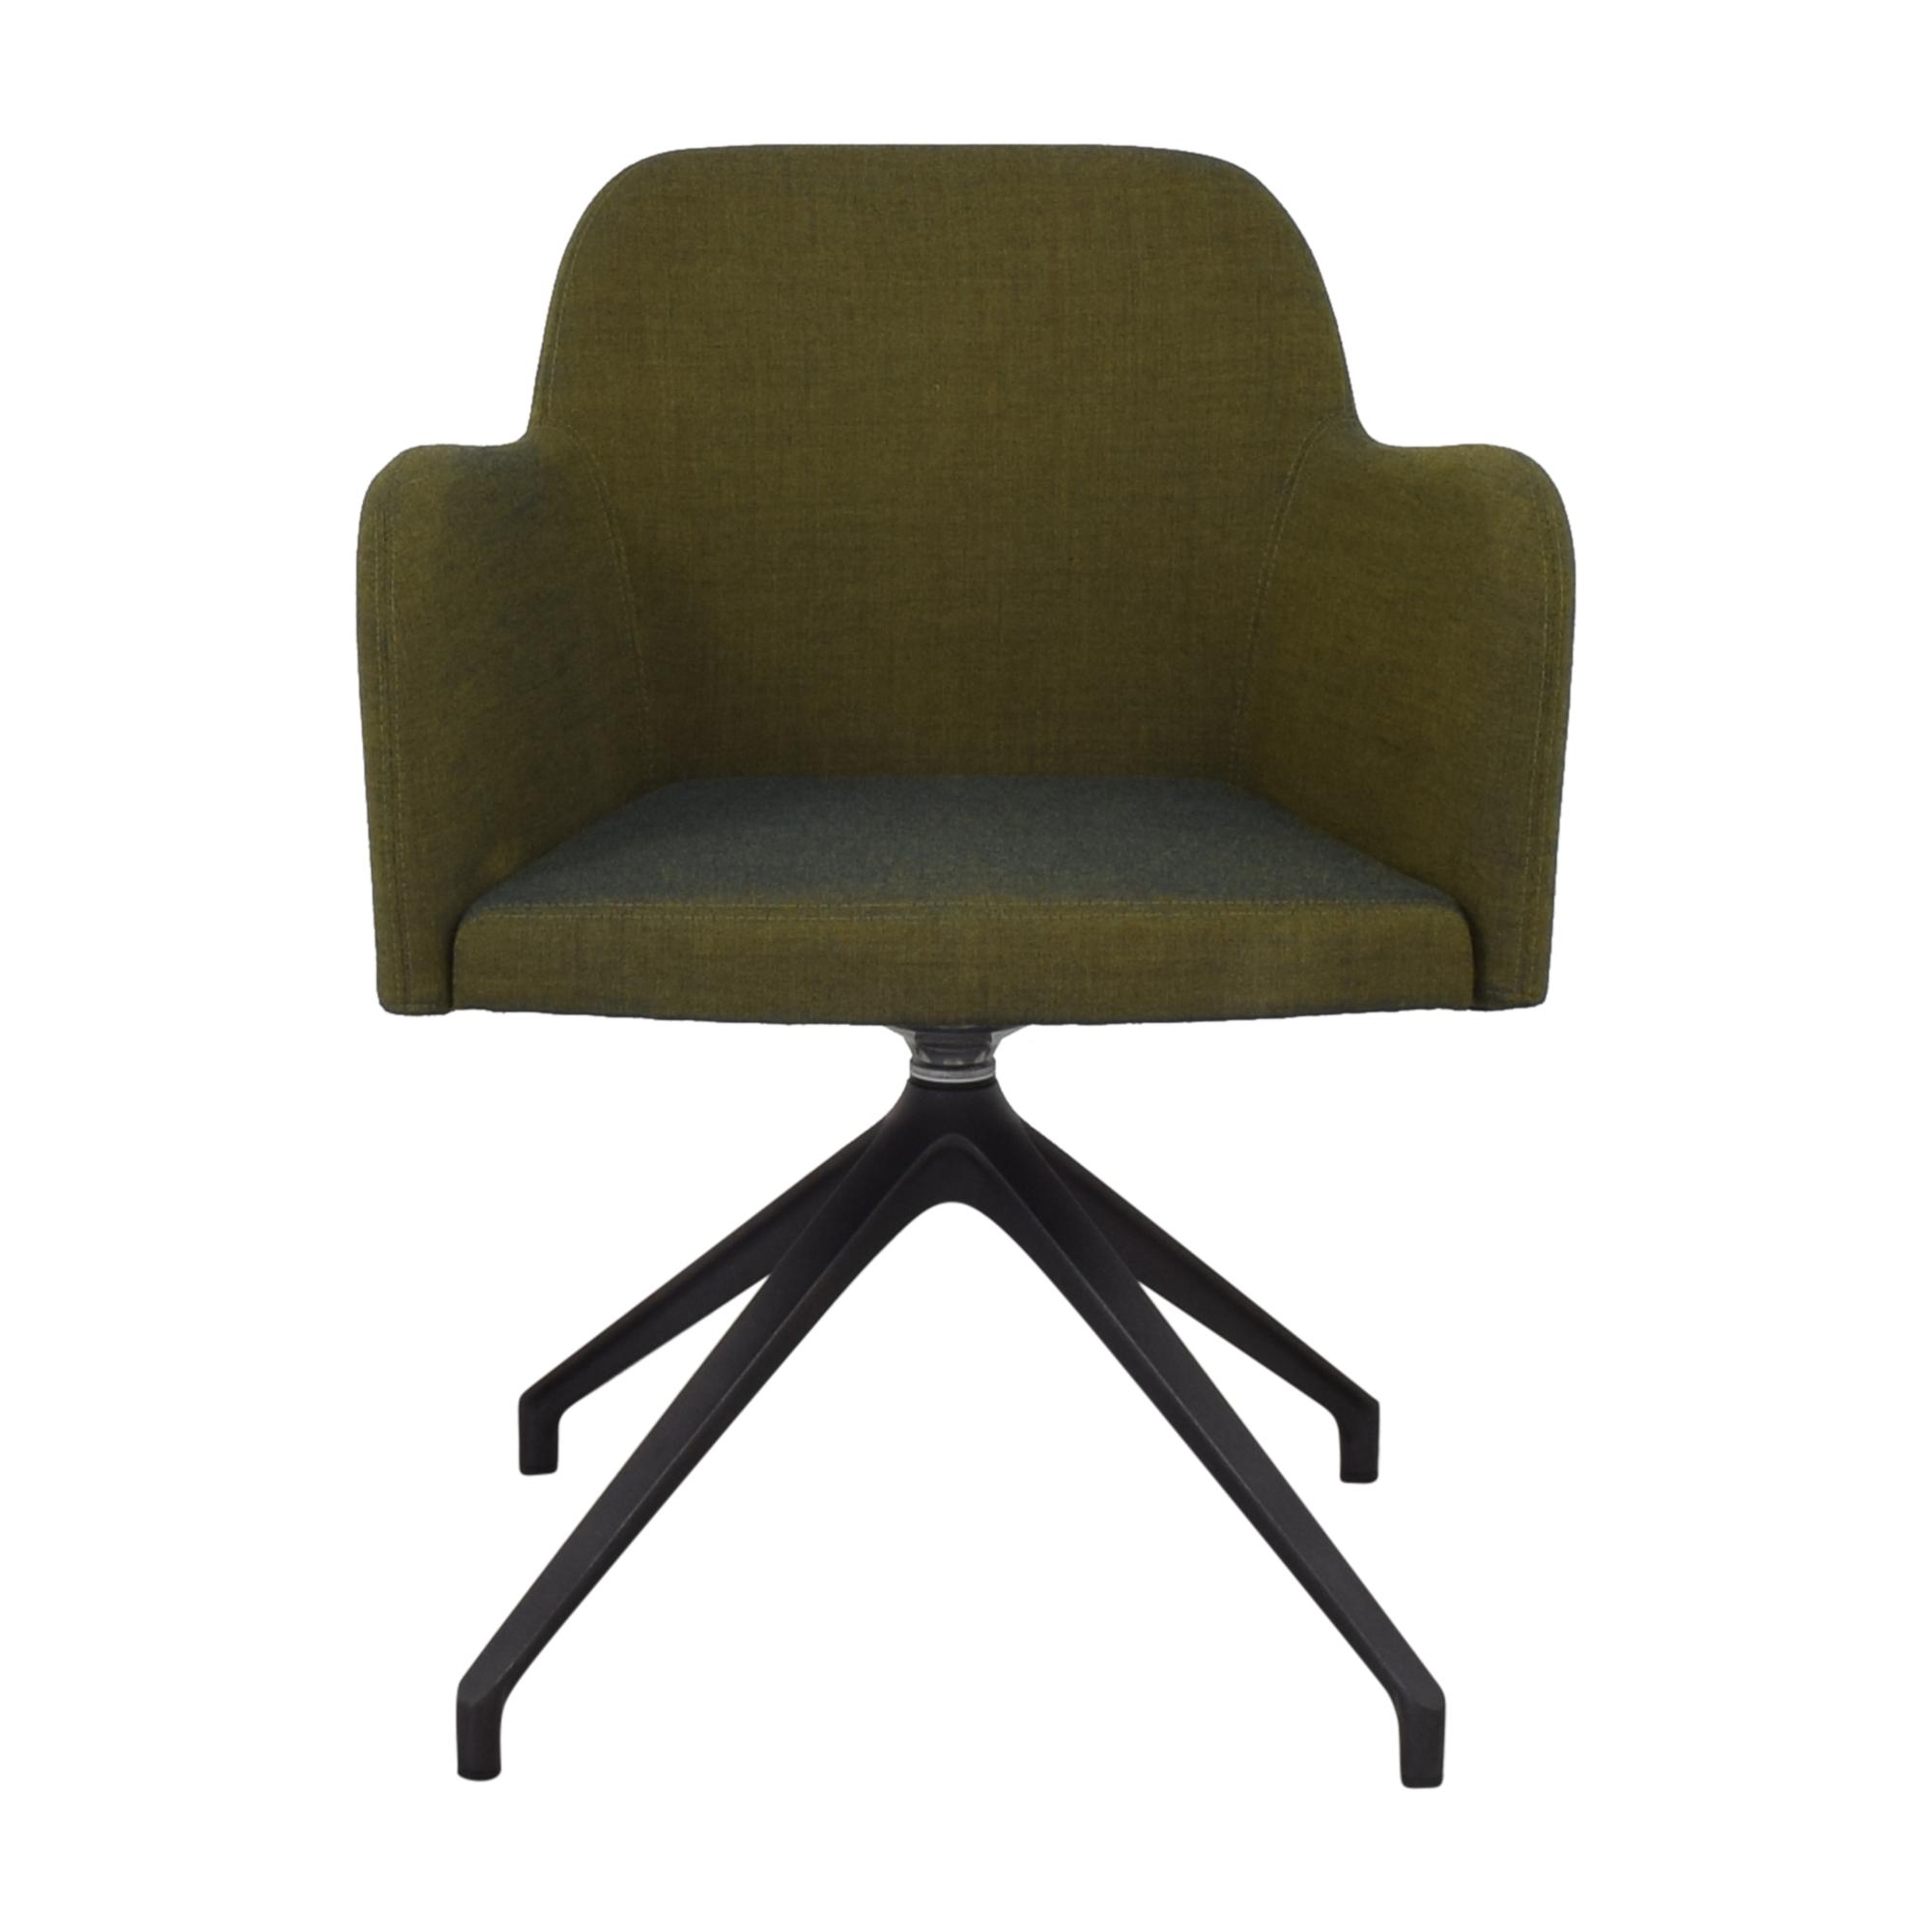 shop Koleksiyon Miranda Cantilever Armchair Koleksiyon Accent Chairs